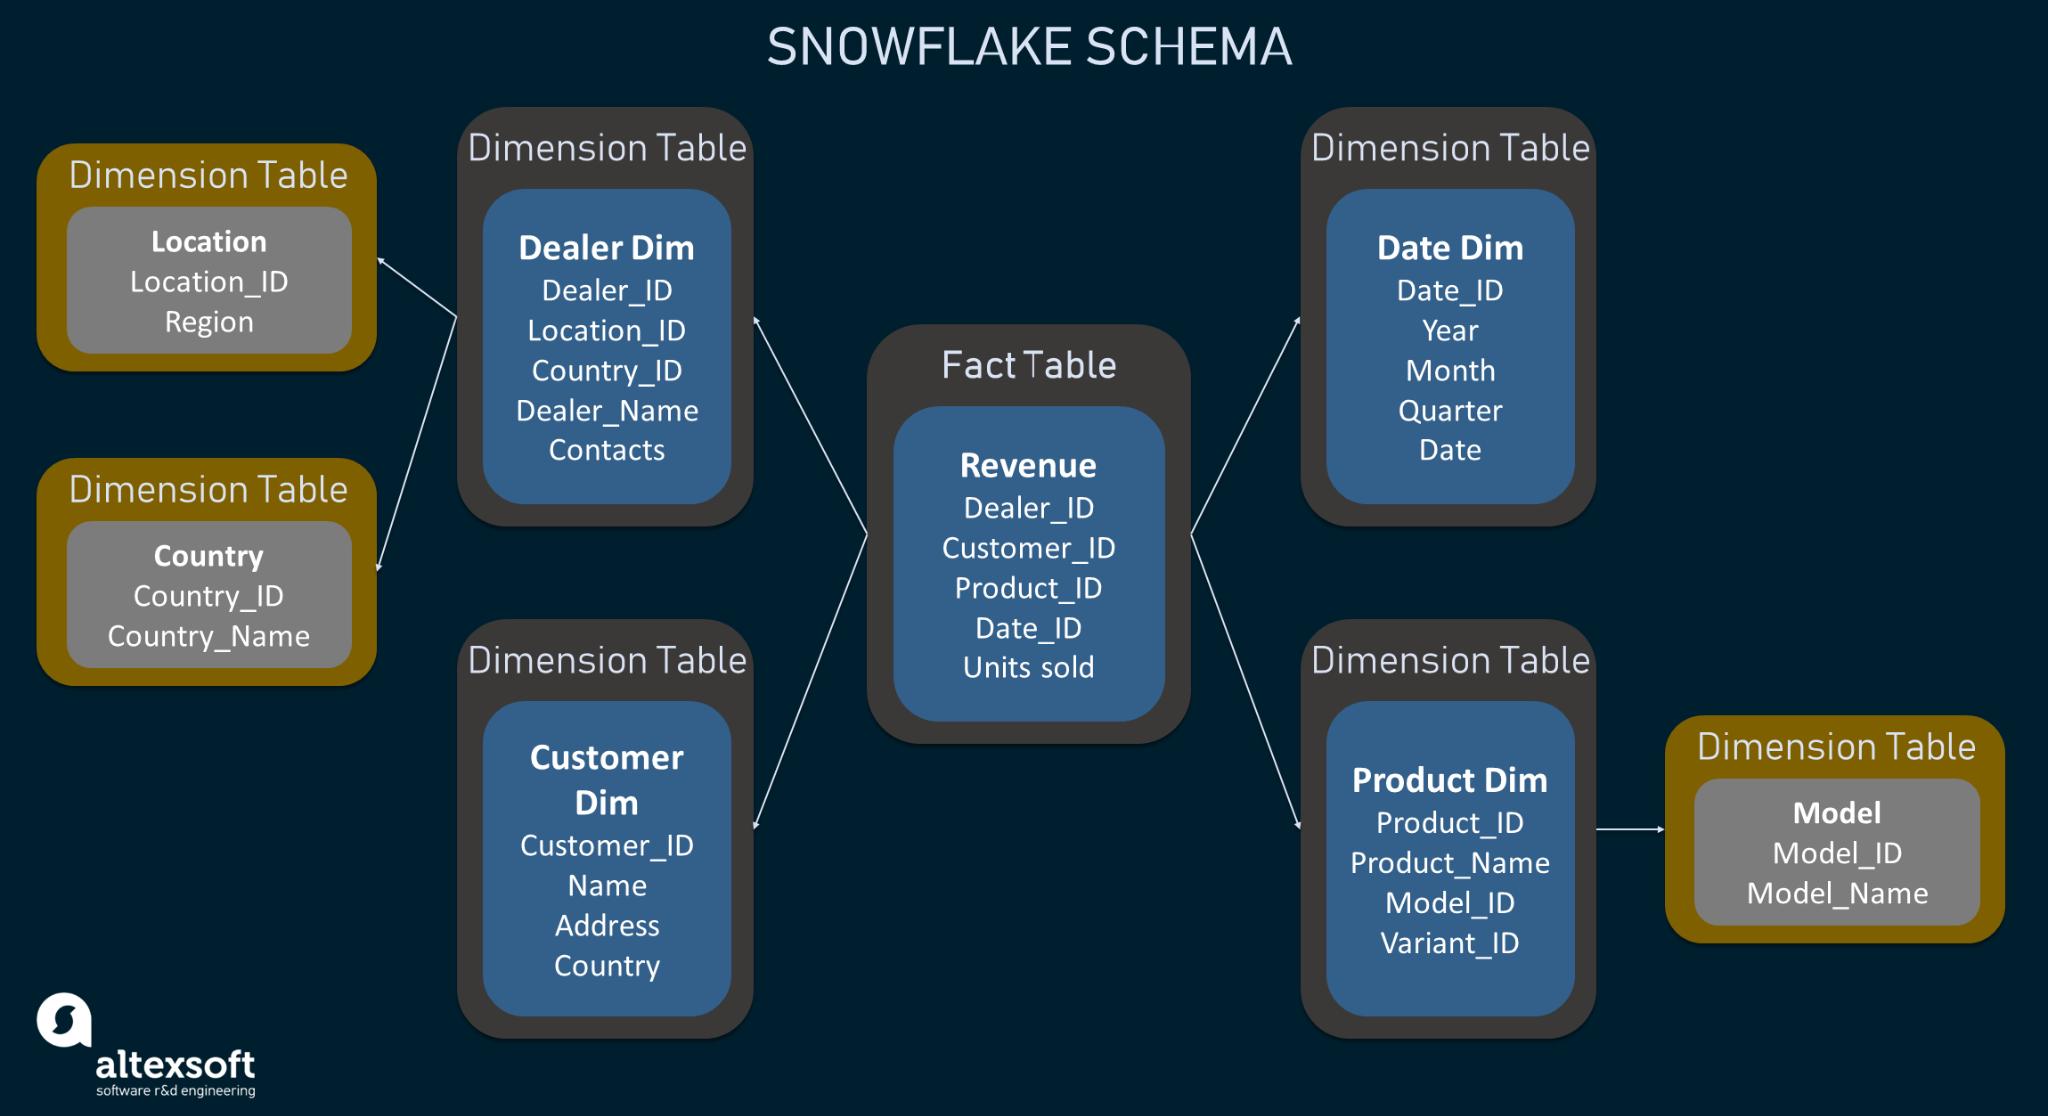 The example of snowflake schema